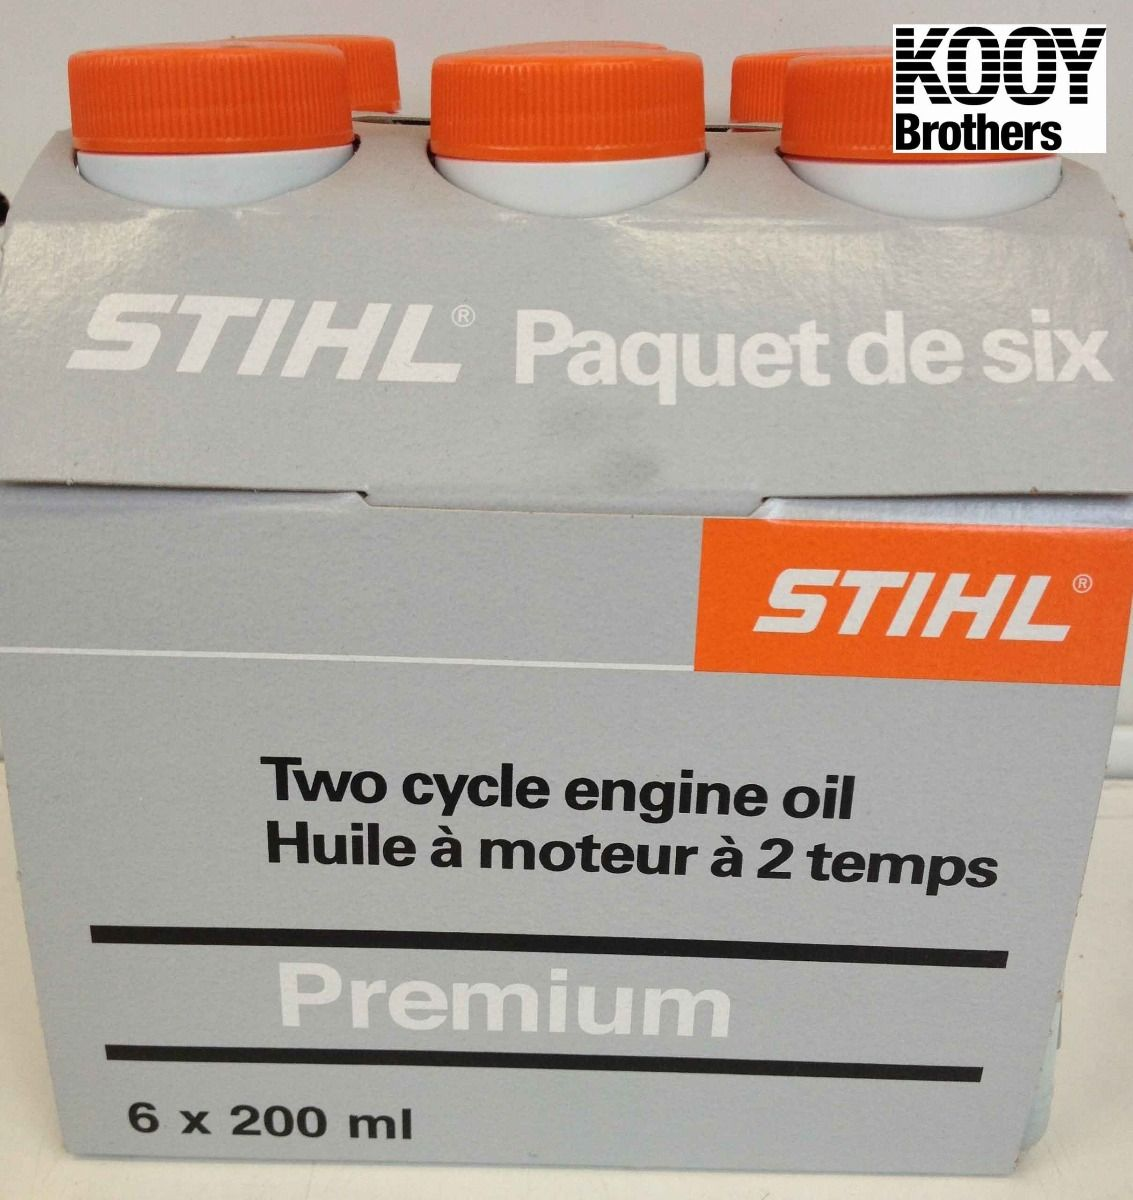 STIHL 6 pack of 200mL engine oil